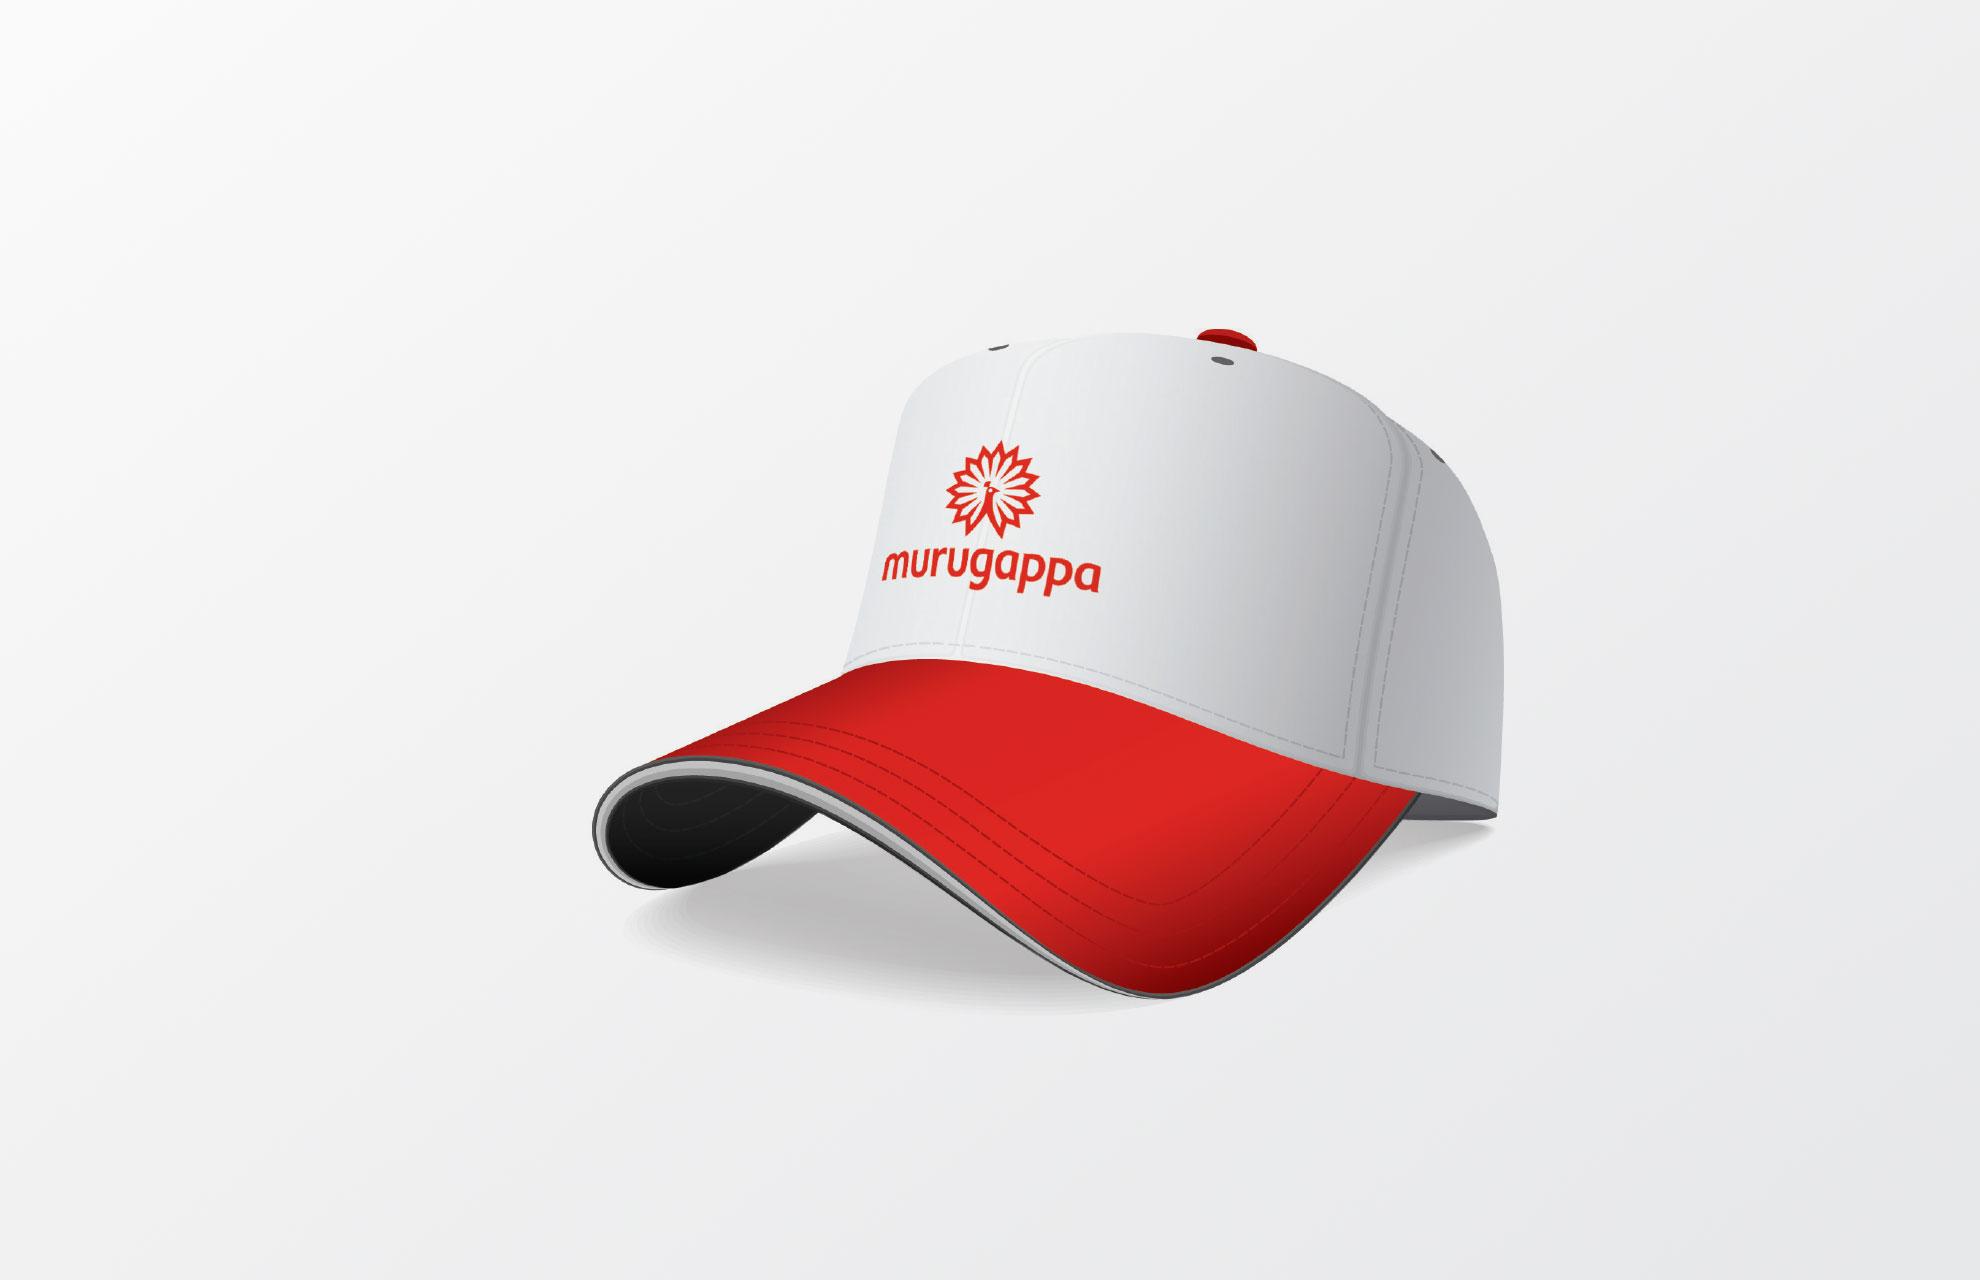 Murugappa-6